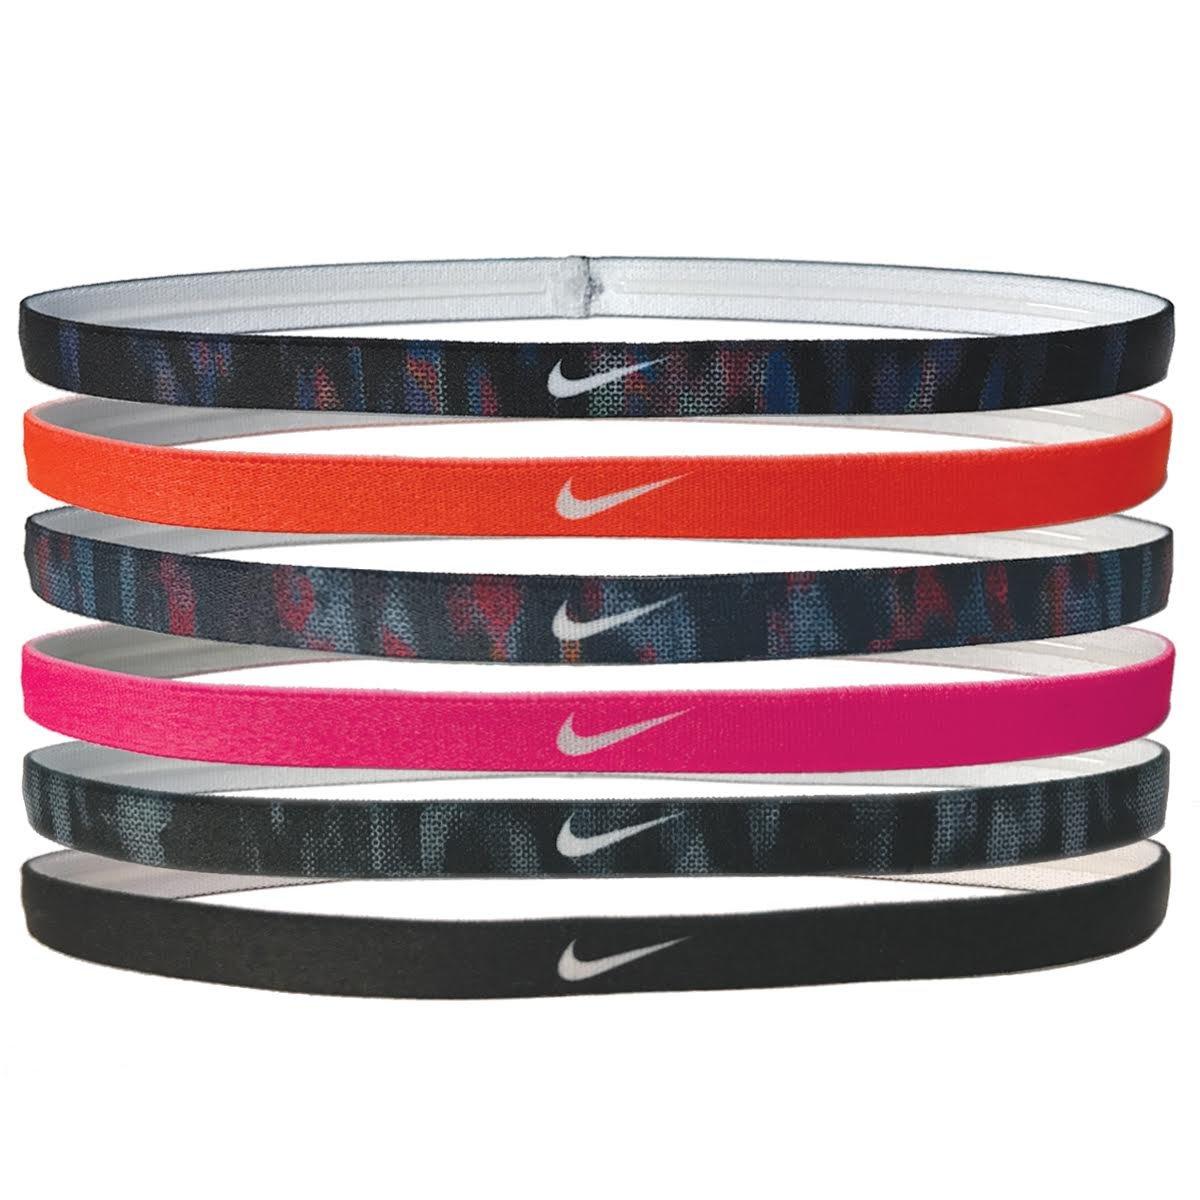 Nike Printed Headbands Assorted 6pk Black/Hyper Crimson/Binary Blue/Racer Pink